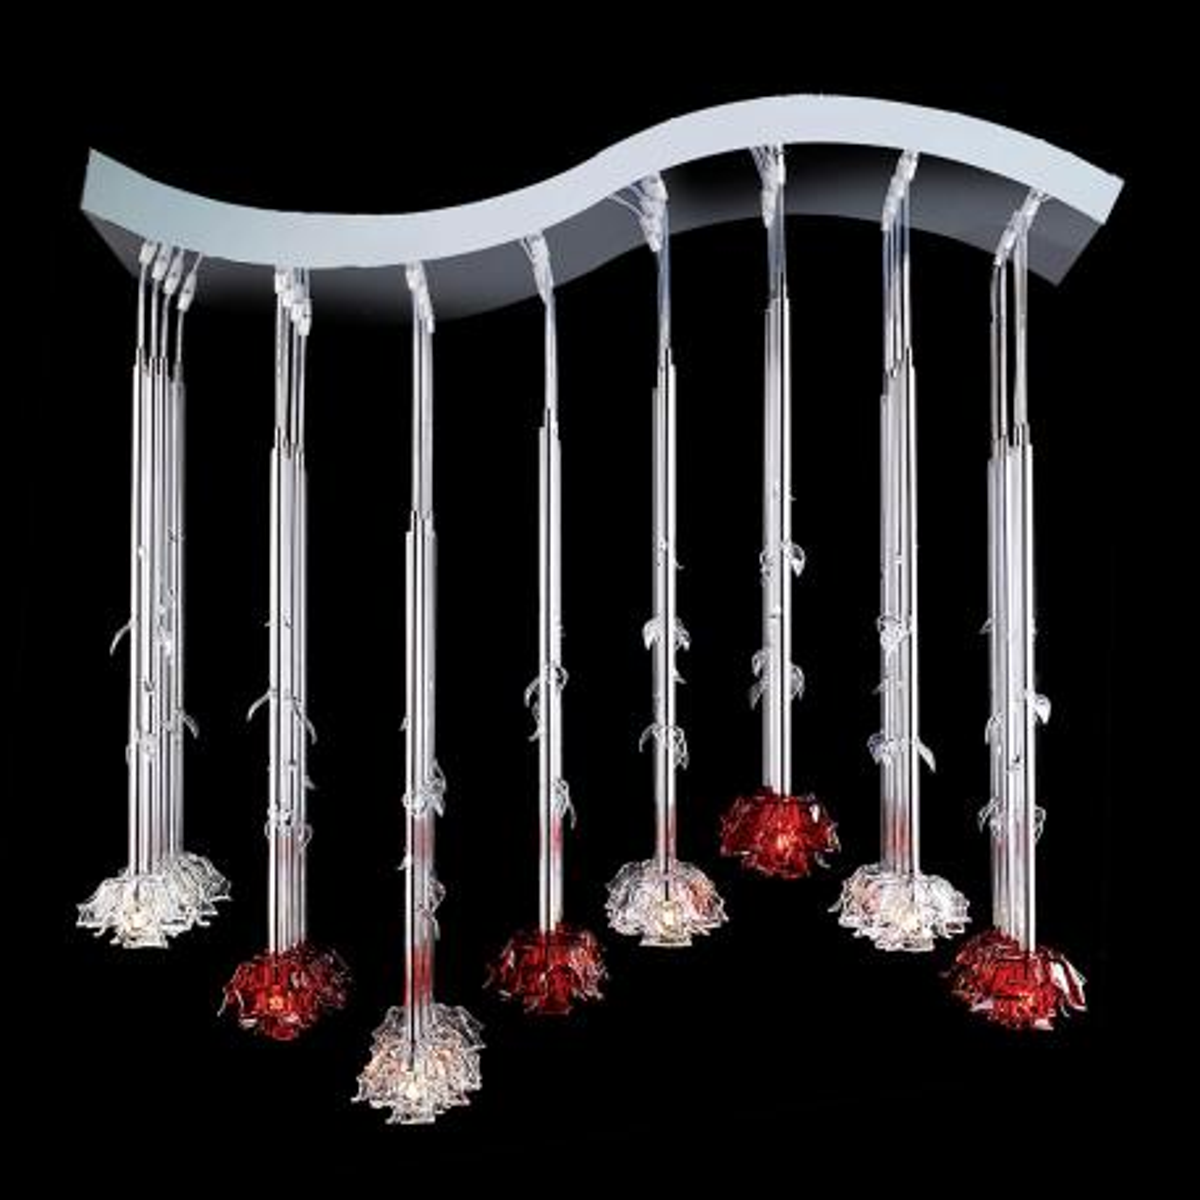 """Lola"" Murano glass pendant light - 64 lights -"